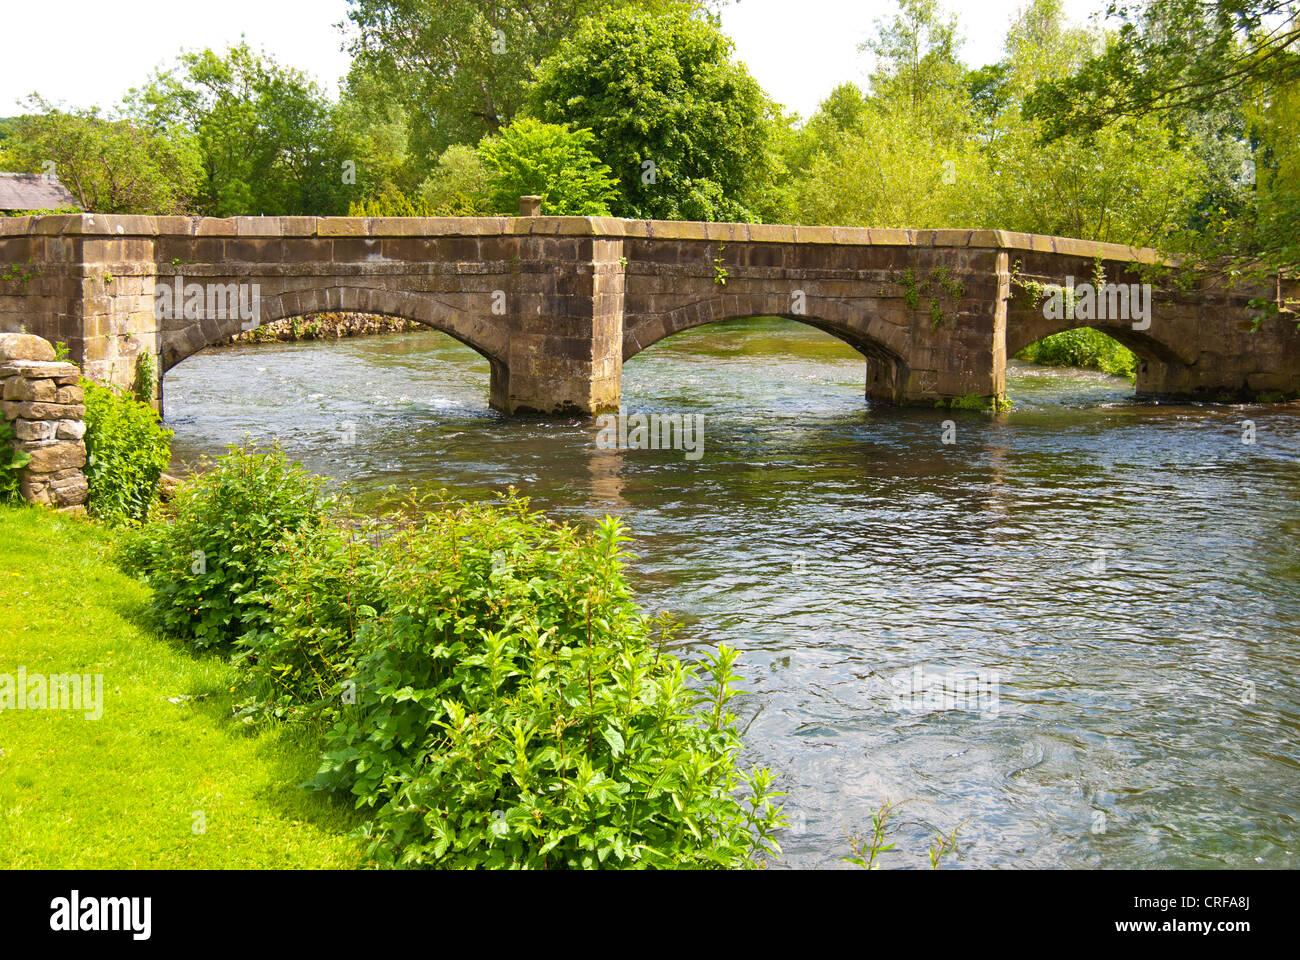 Holme Bridge, Bakewell, a packhorse bridge over the River Wye - Stock Image